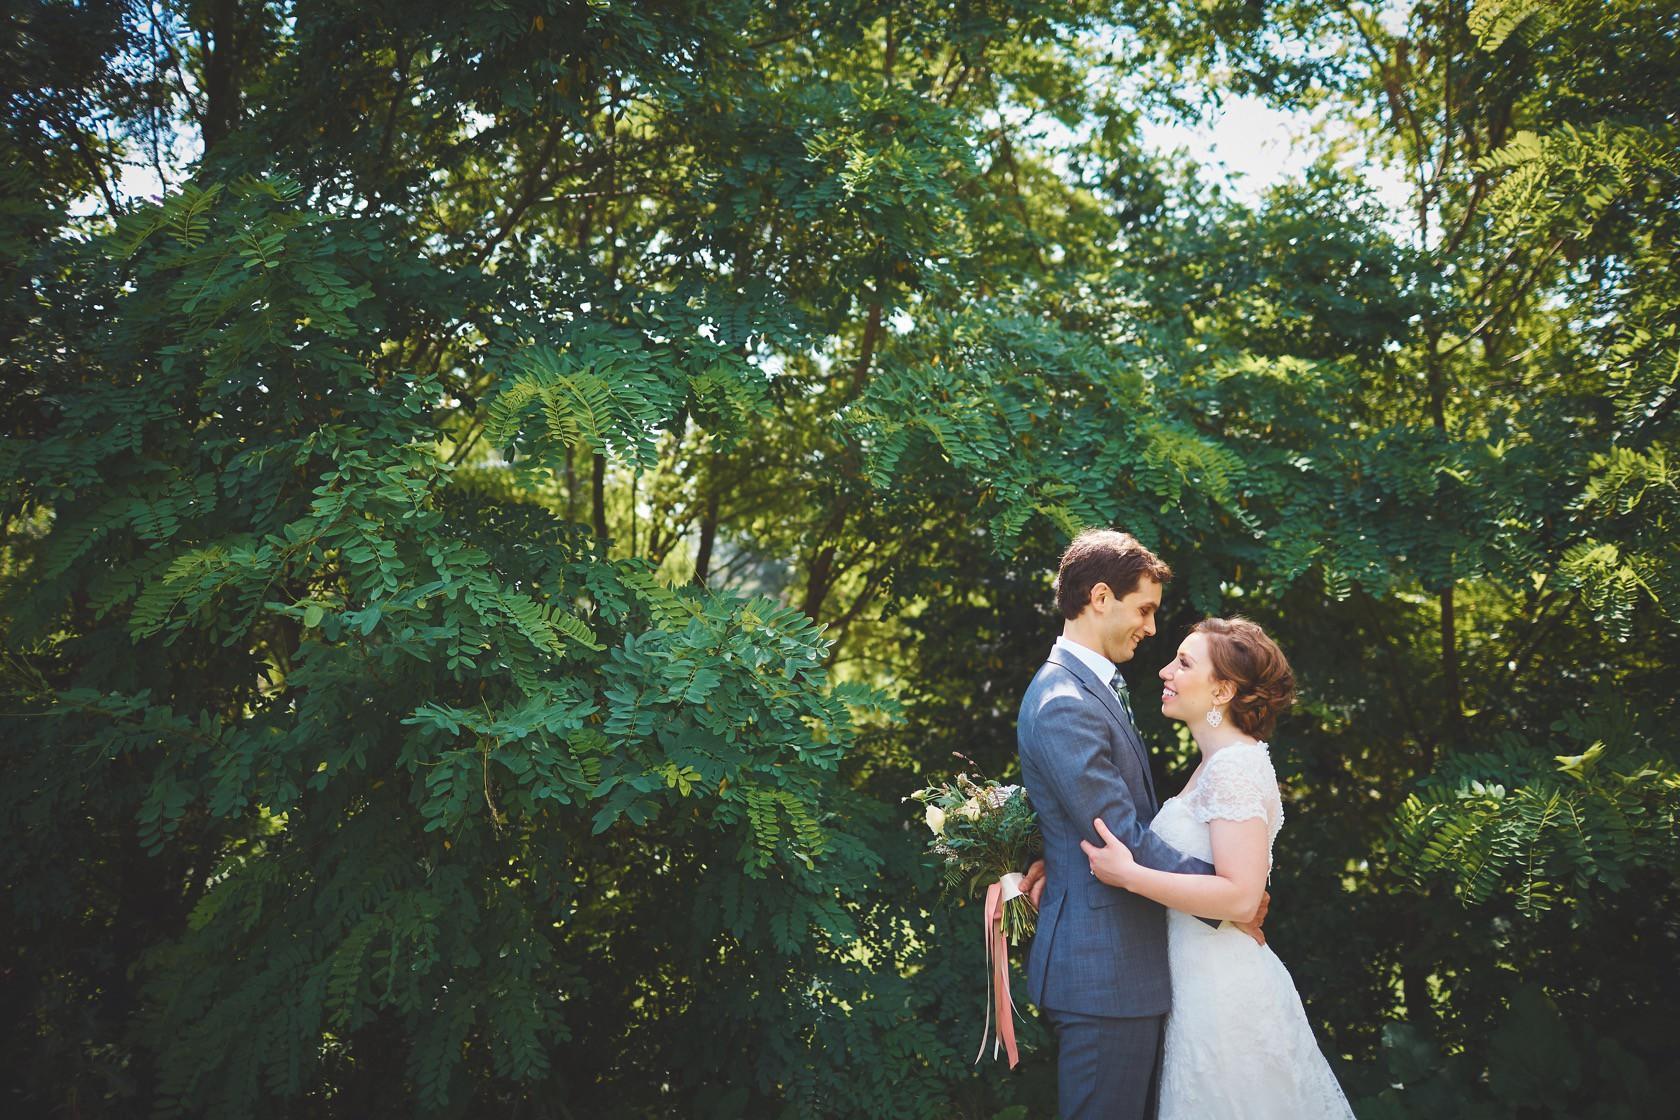 stephen sager photography 0020 fine art wedding photography